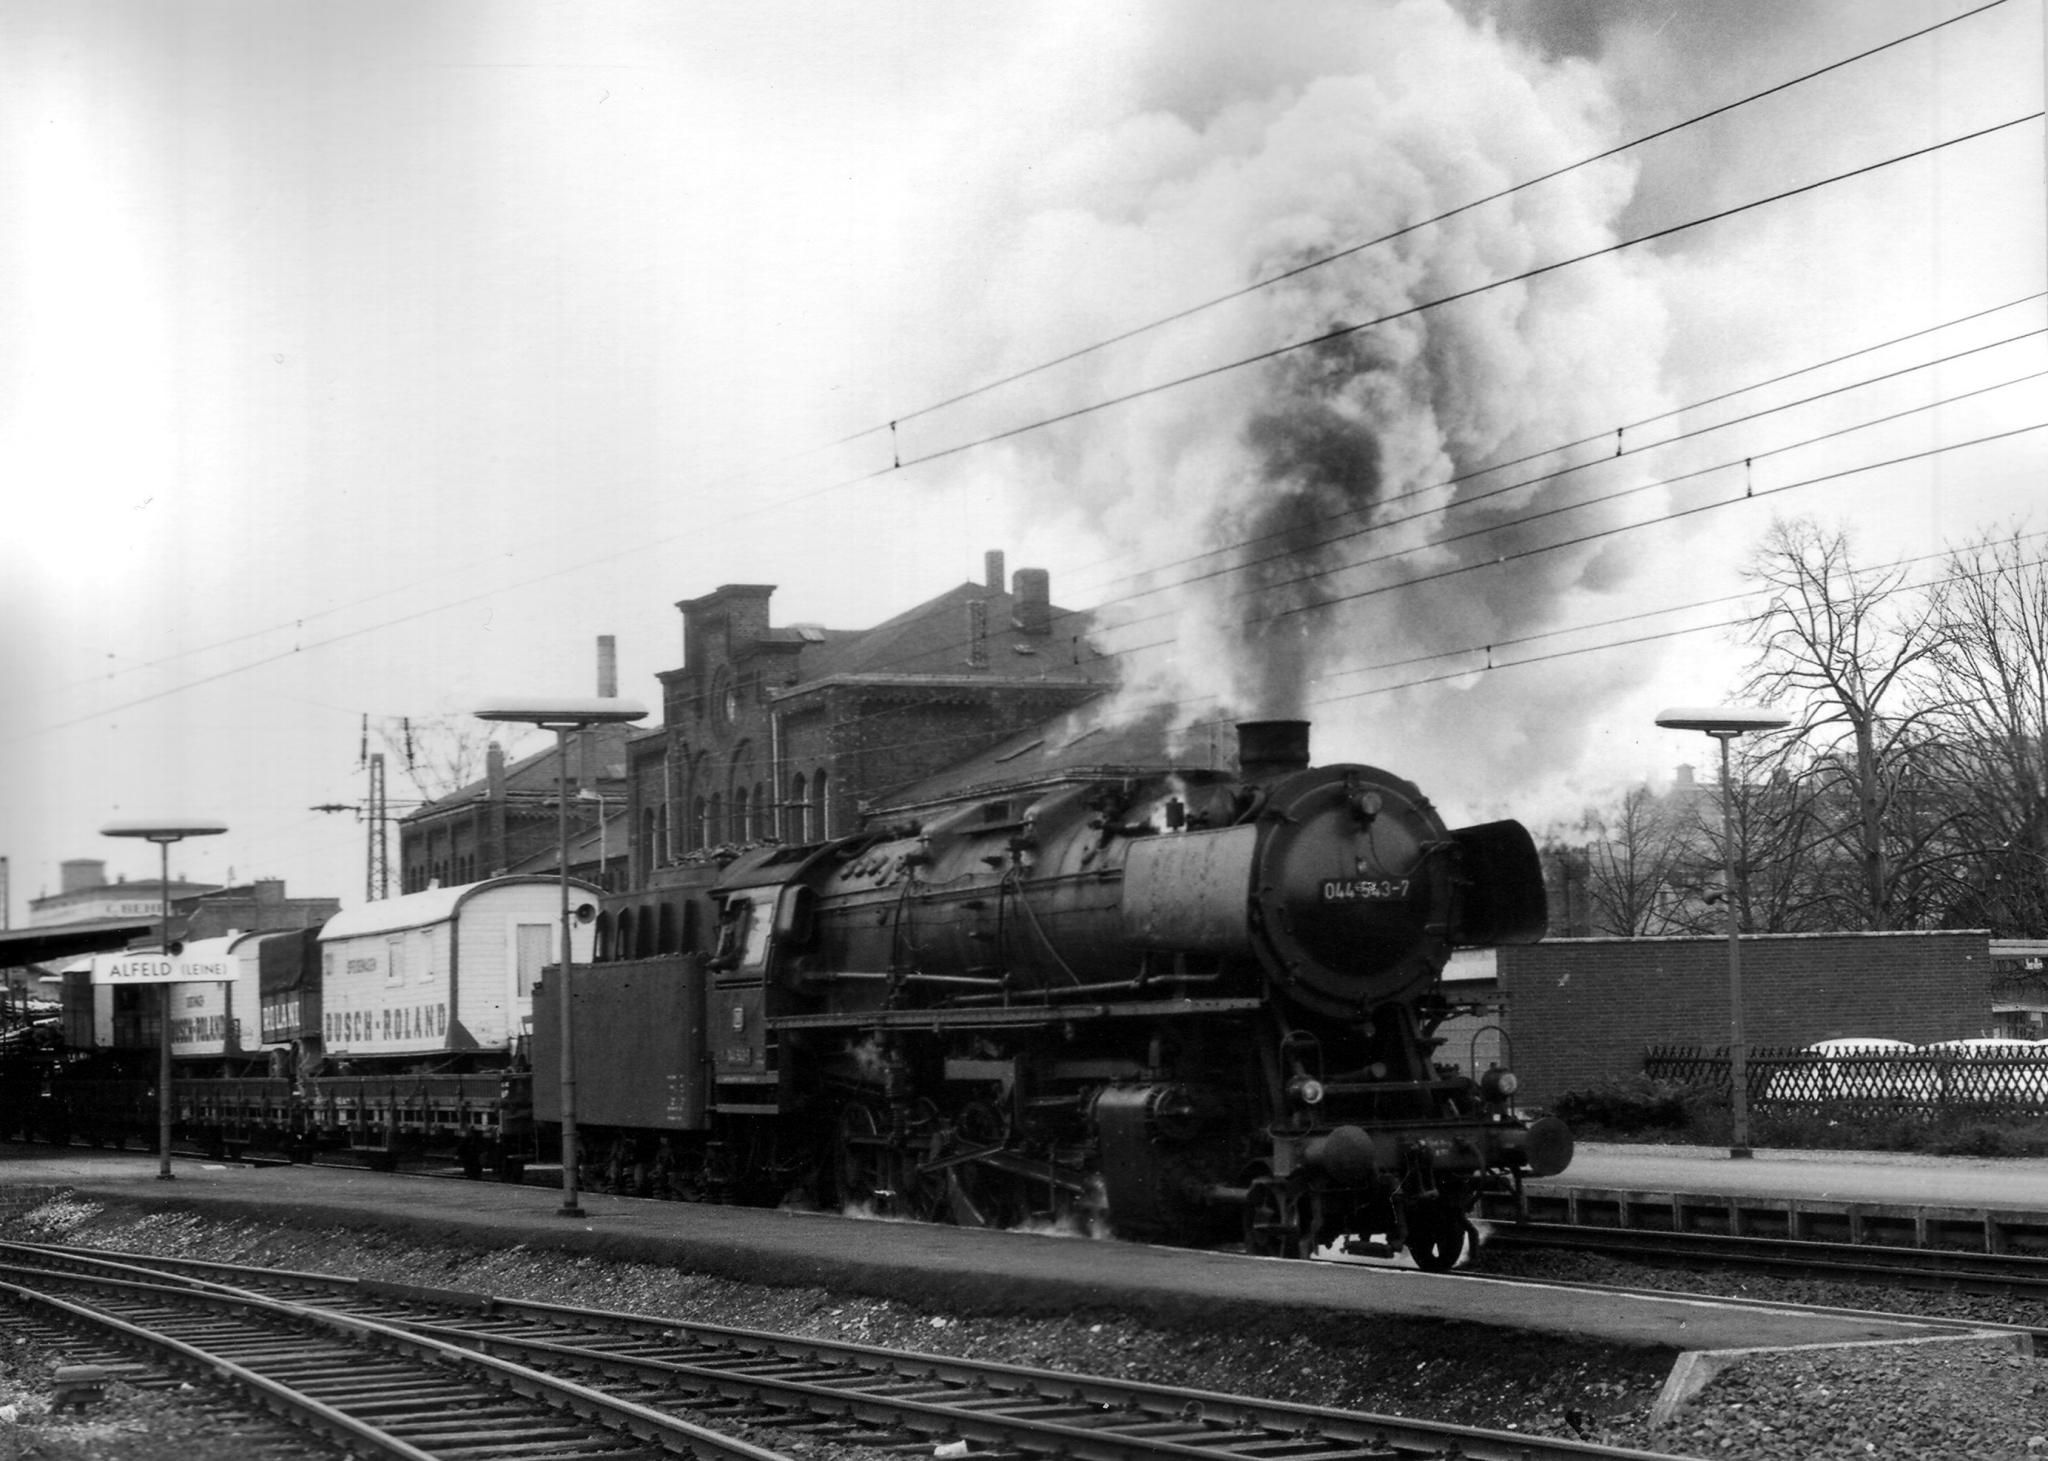 Bahnhof1970er-29-CircusBuschRolandWinterquartier